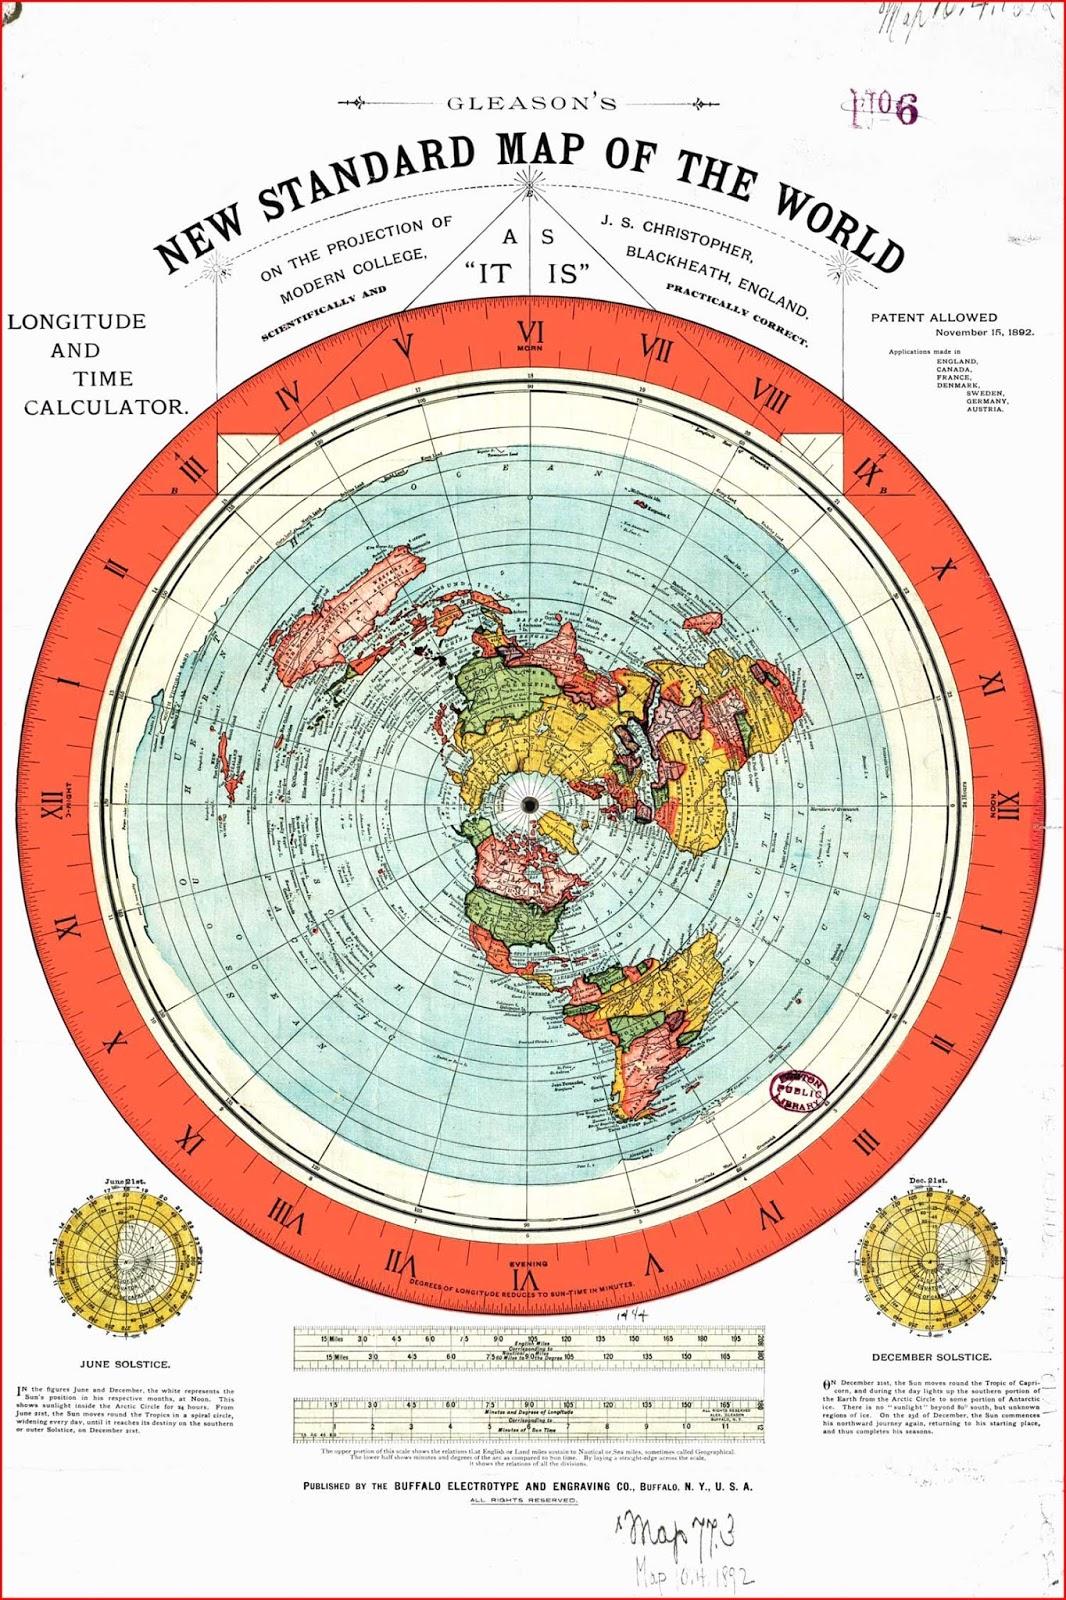 image: Flat map